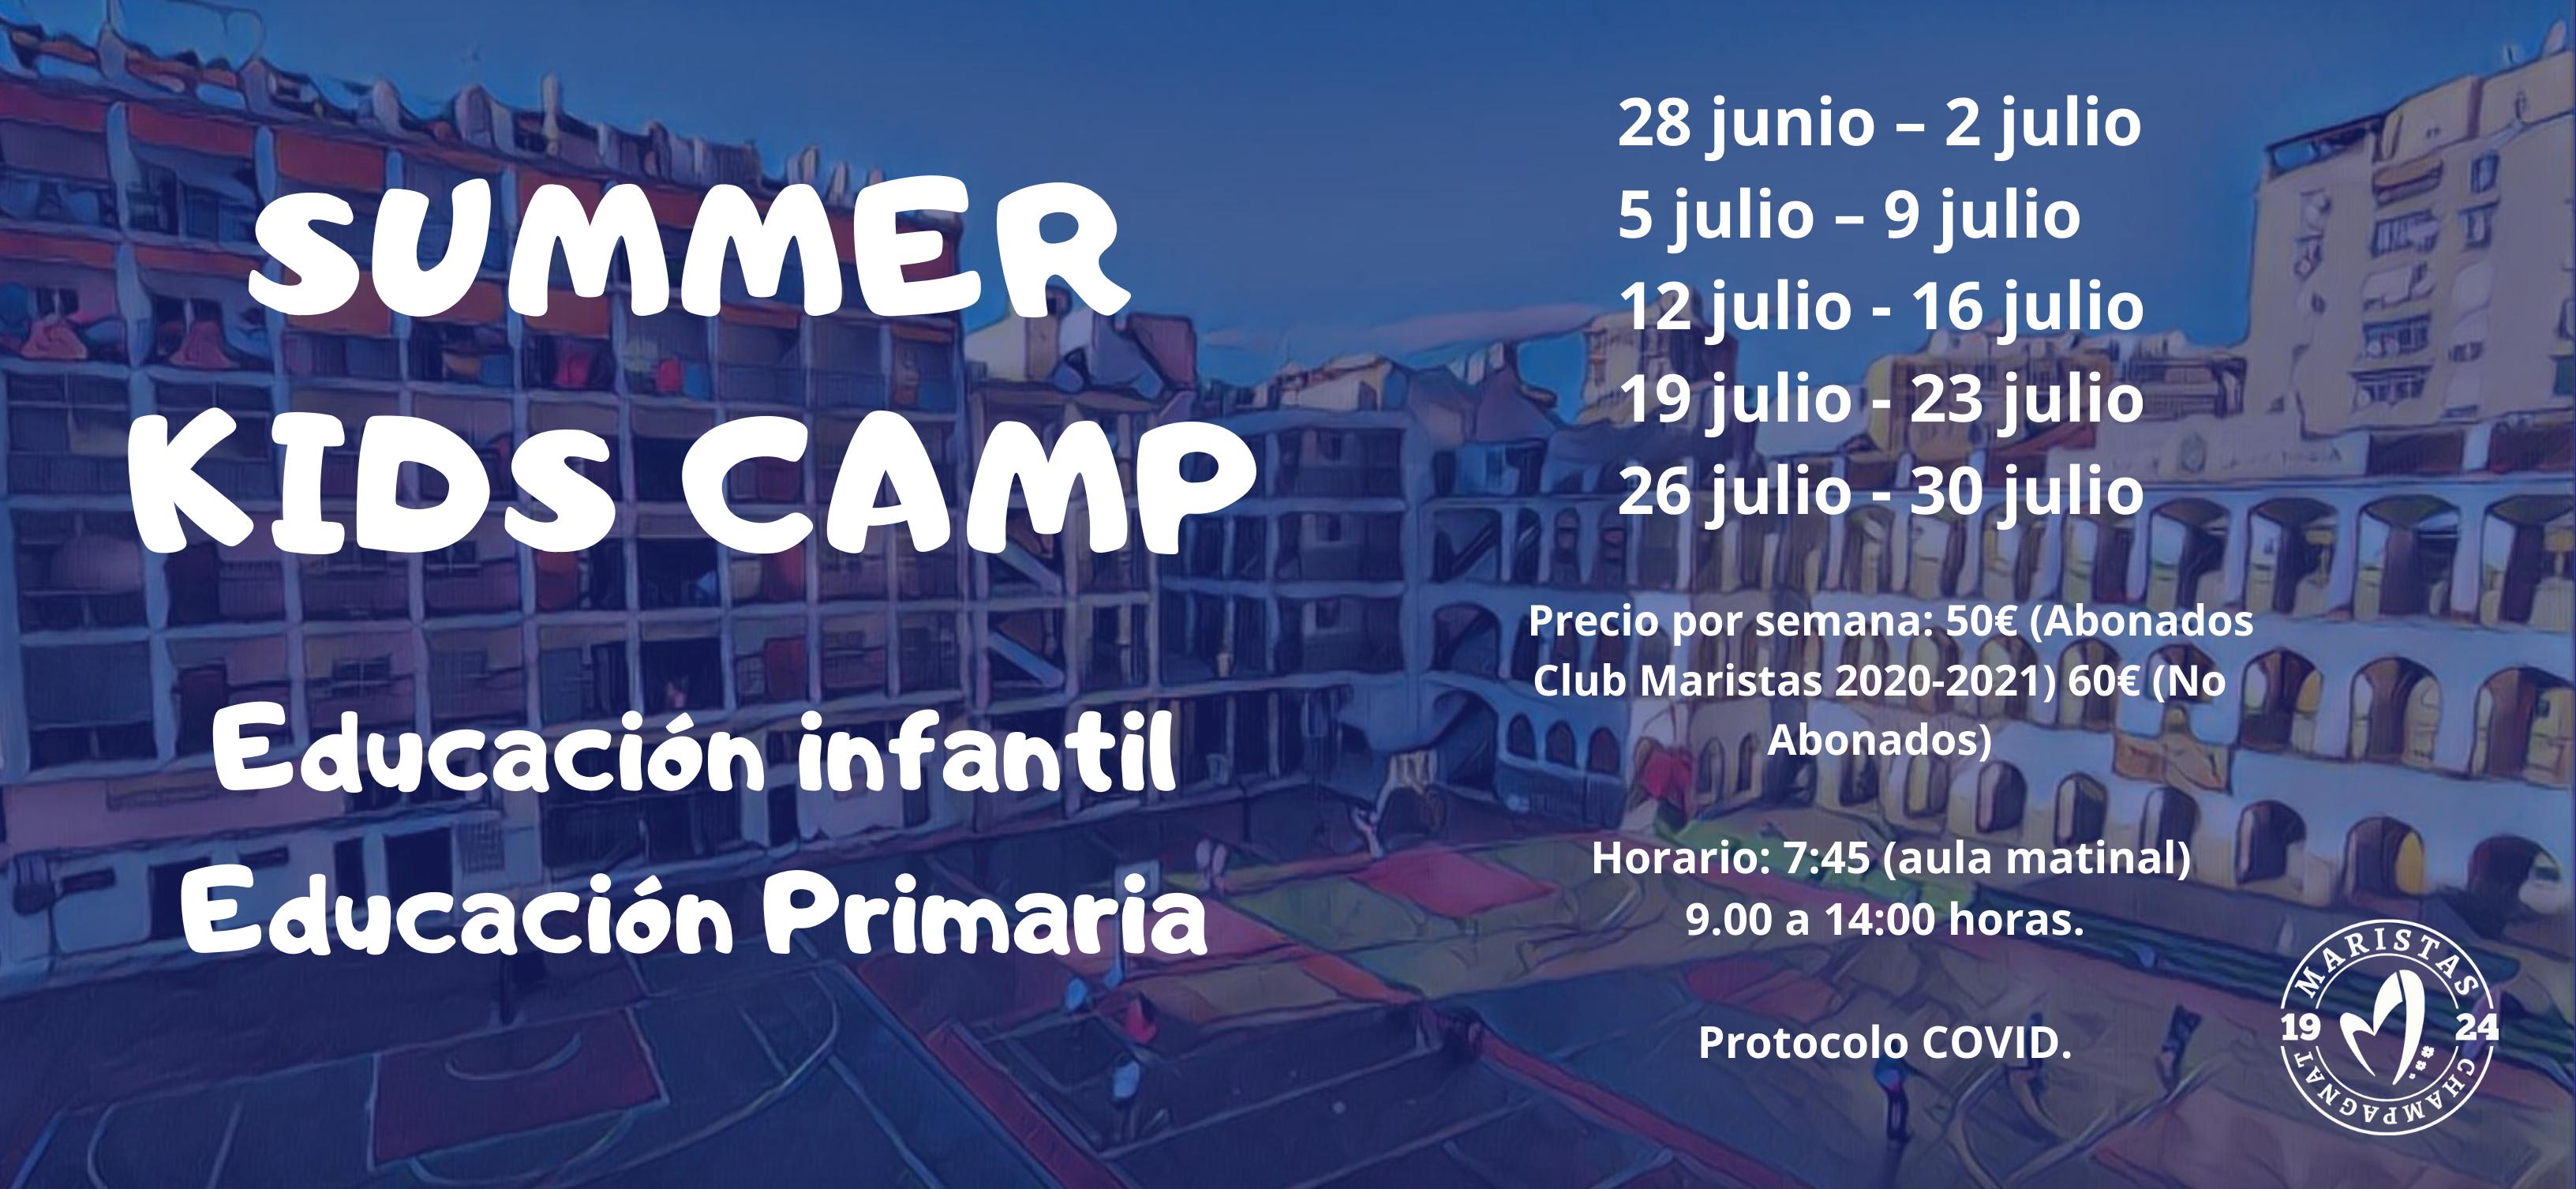 summer-kids-camp-club-maristas-malaga